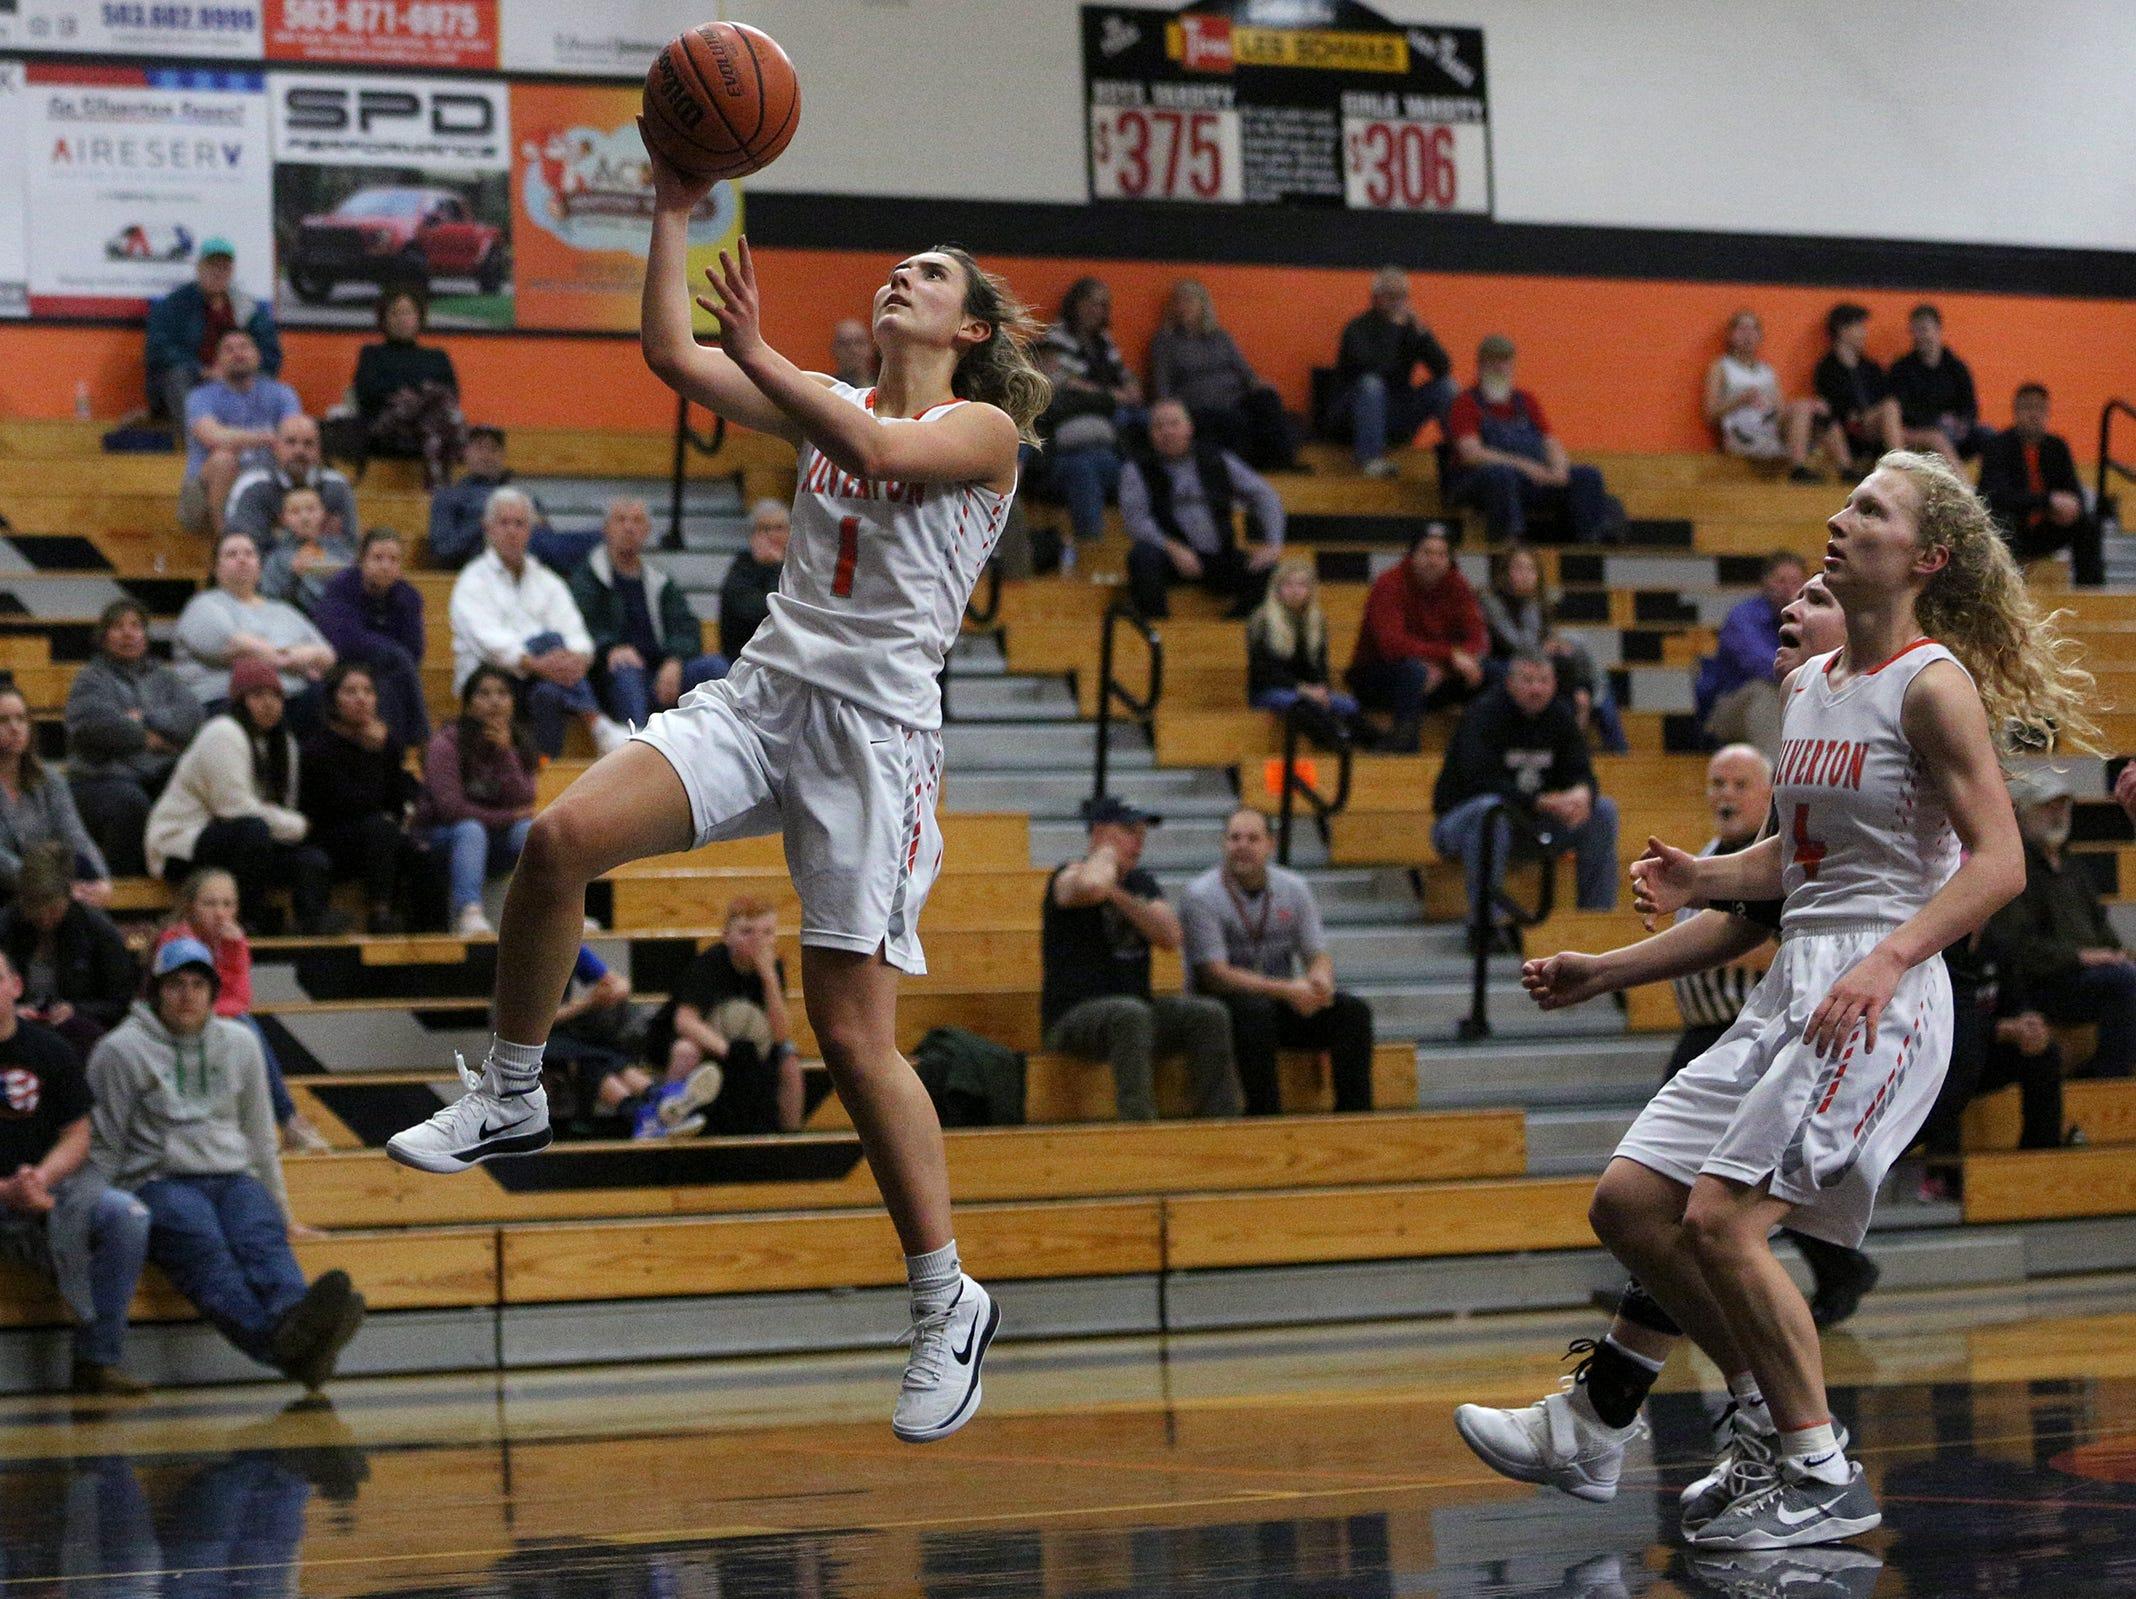 Silverton's Jori Paradis (1) goes for the basket during the Dallas High School vs. Silverton High School girls basketball game in Silverton on Tuesday, Dec. 8, 2019.